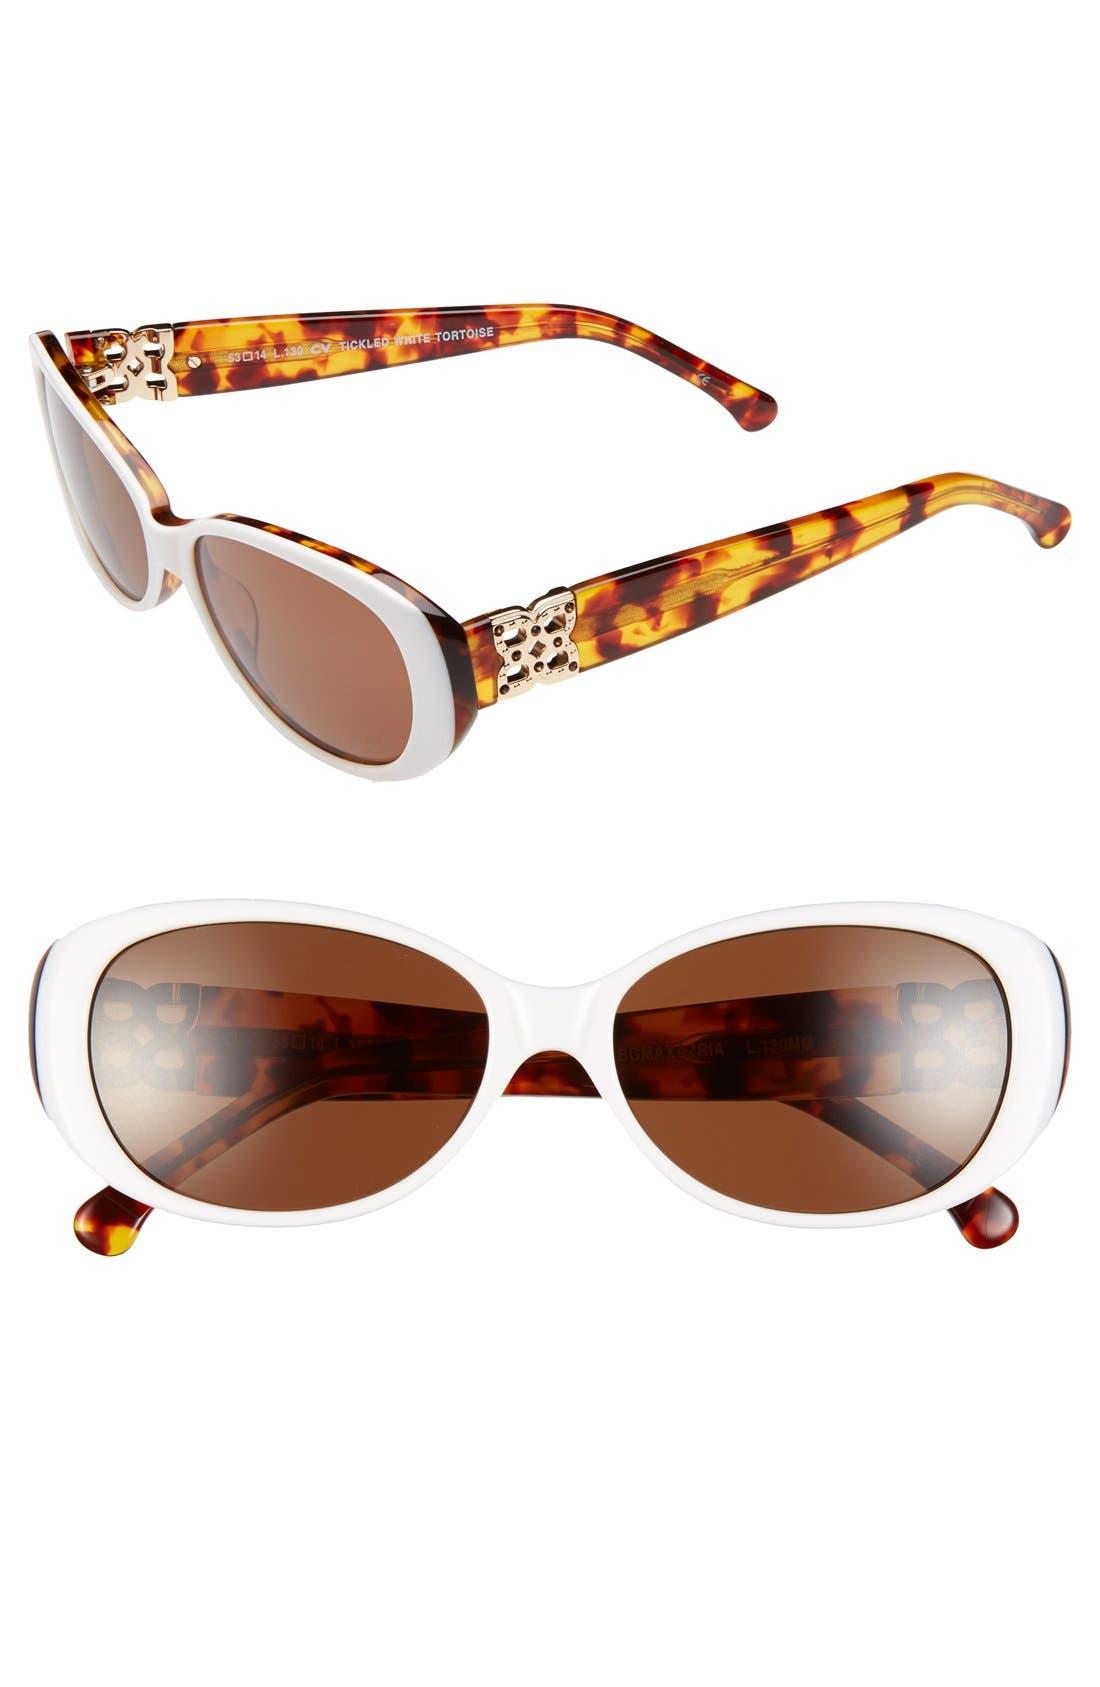 Main Image - BCBGMAXAZRIA 'Tickled' 53mm Sunglasses